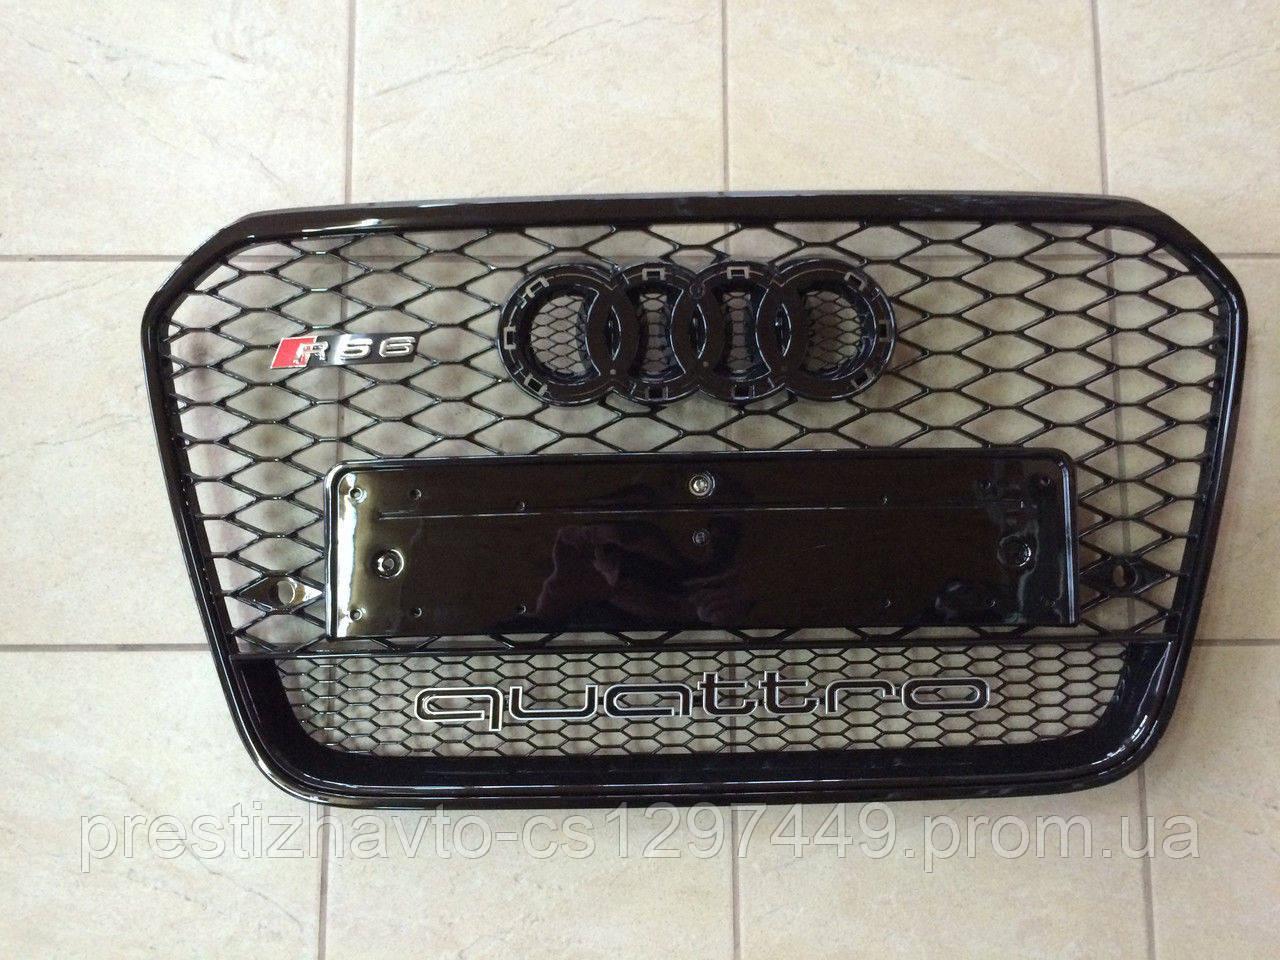 Решетка радиатора на Audi A6 RS6 Quattro (2012-2015)